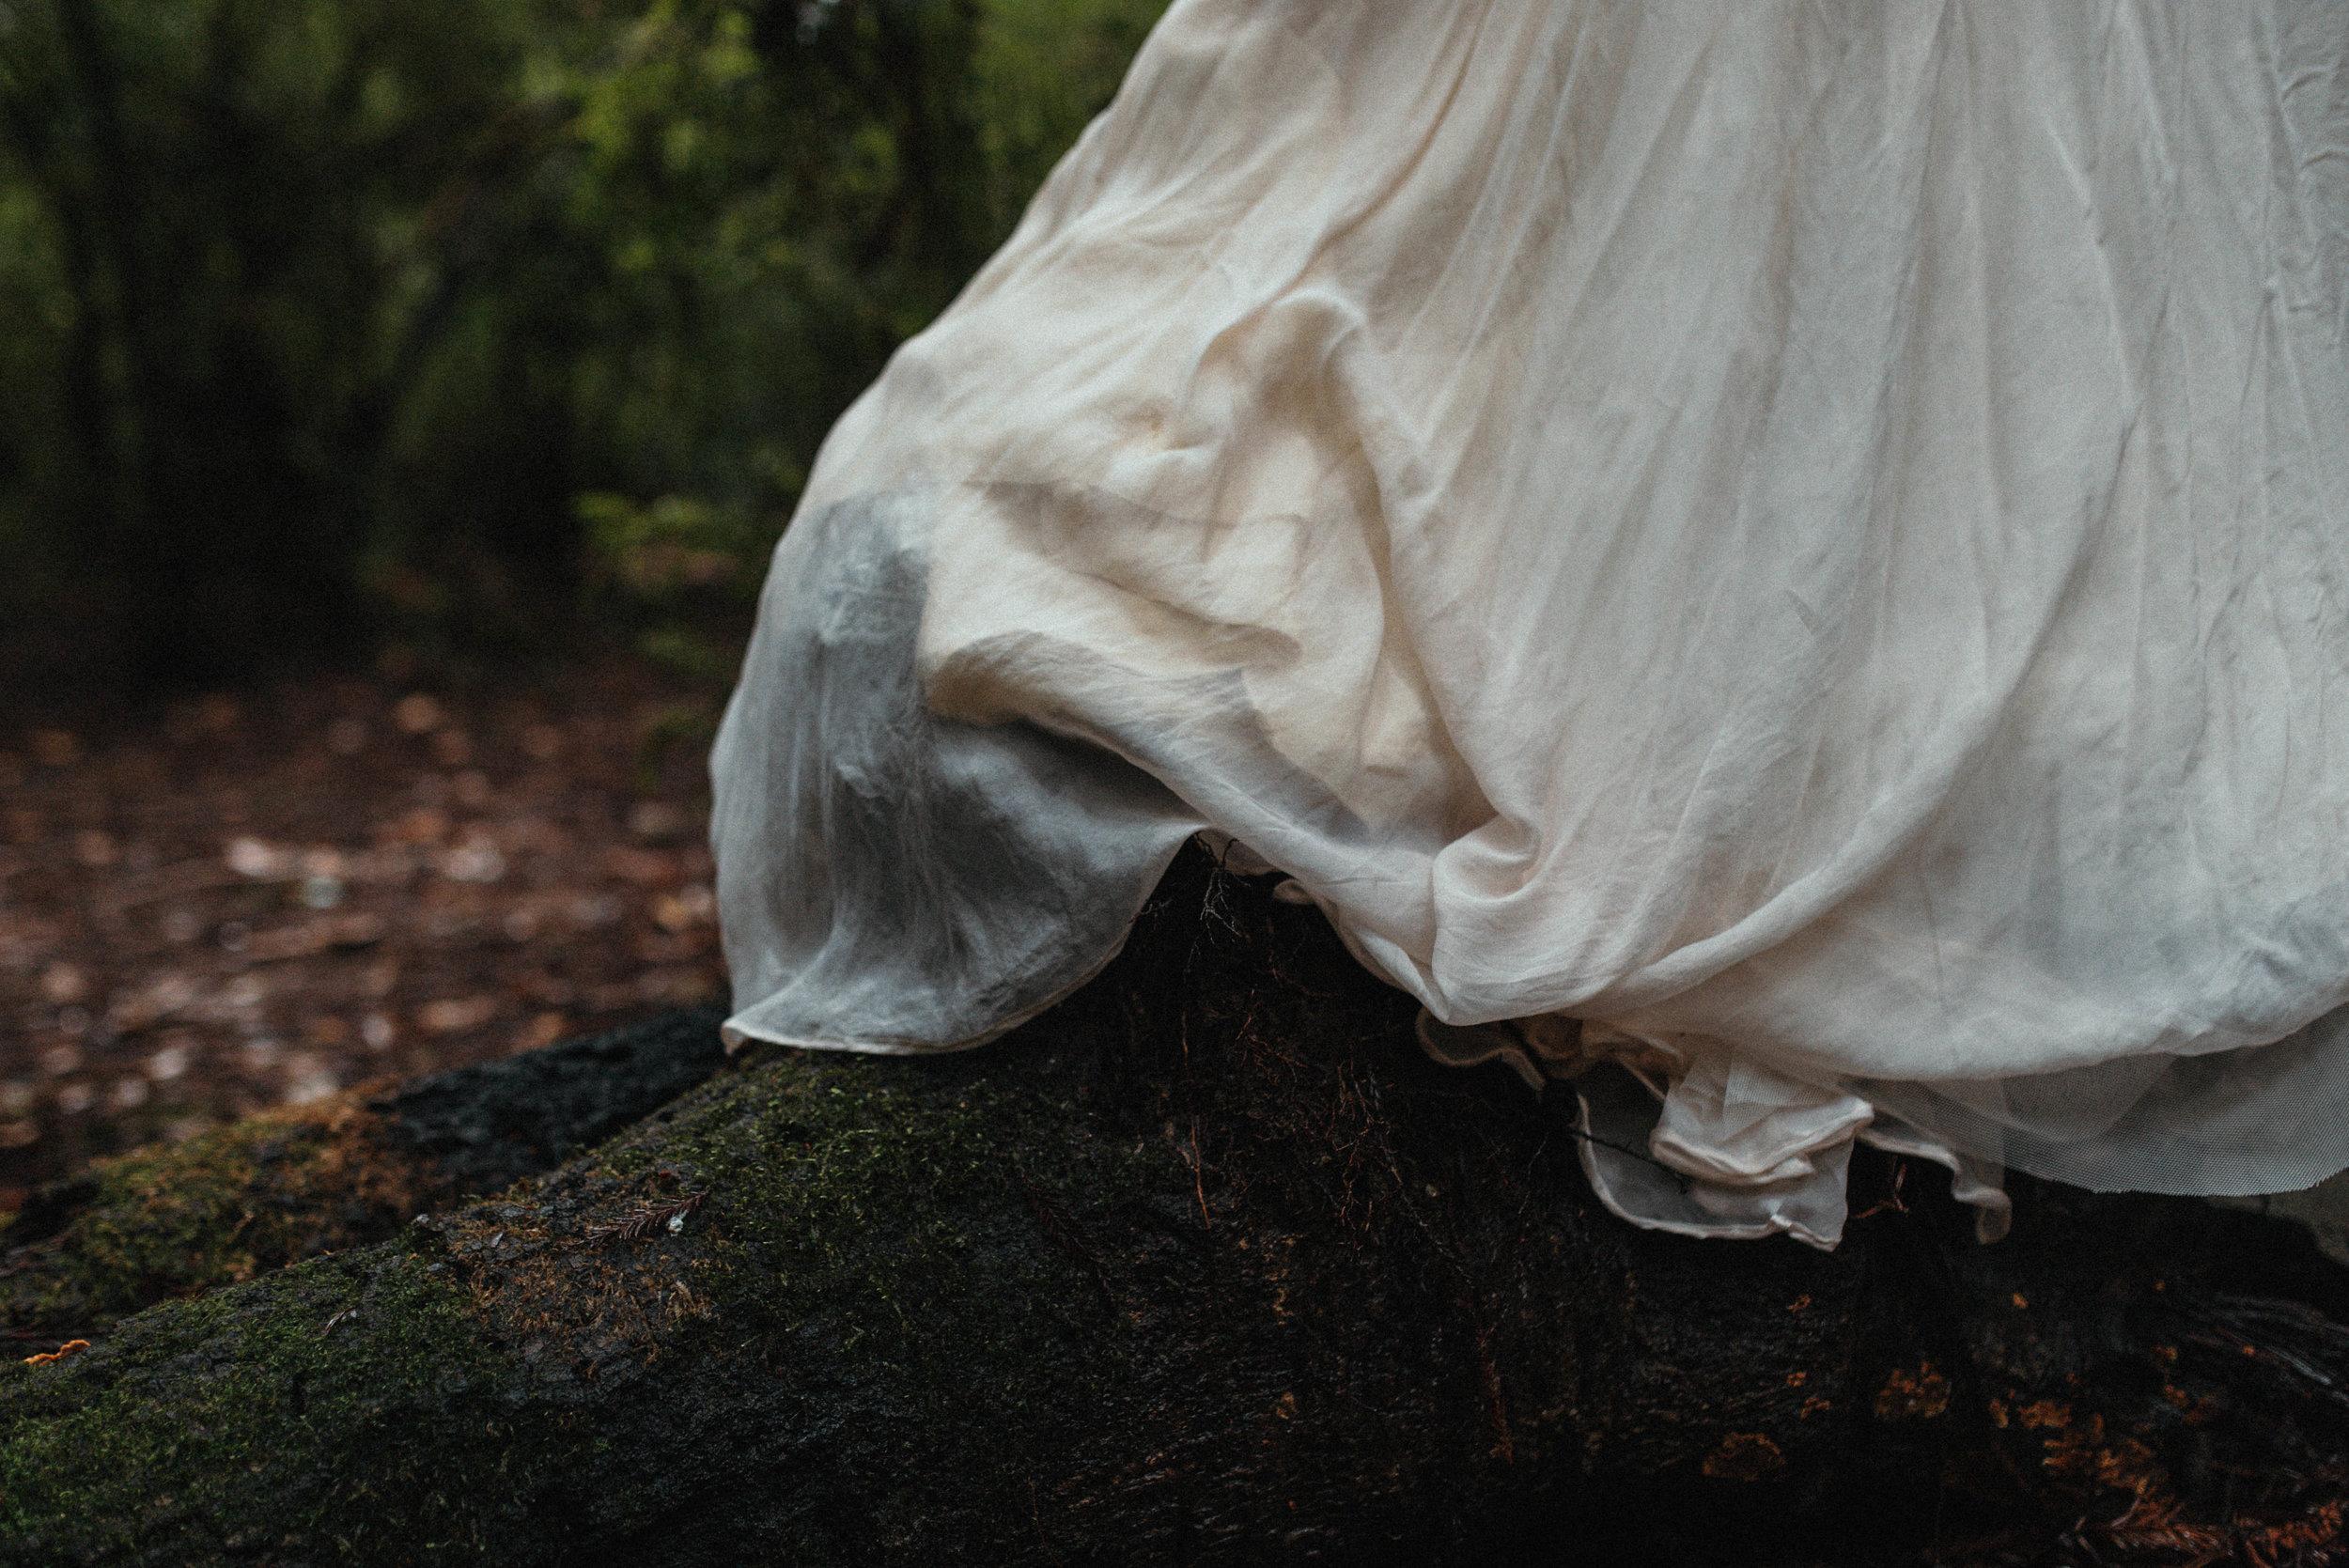 Intimiate Redwoods Elopement , Elopement Inspiration, Jessica Heron Images, Northern California Elopement, Oregon Elopement, Oregon Wedding, Elopement Ideas, homeade dress, diy dress